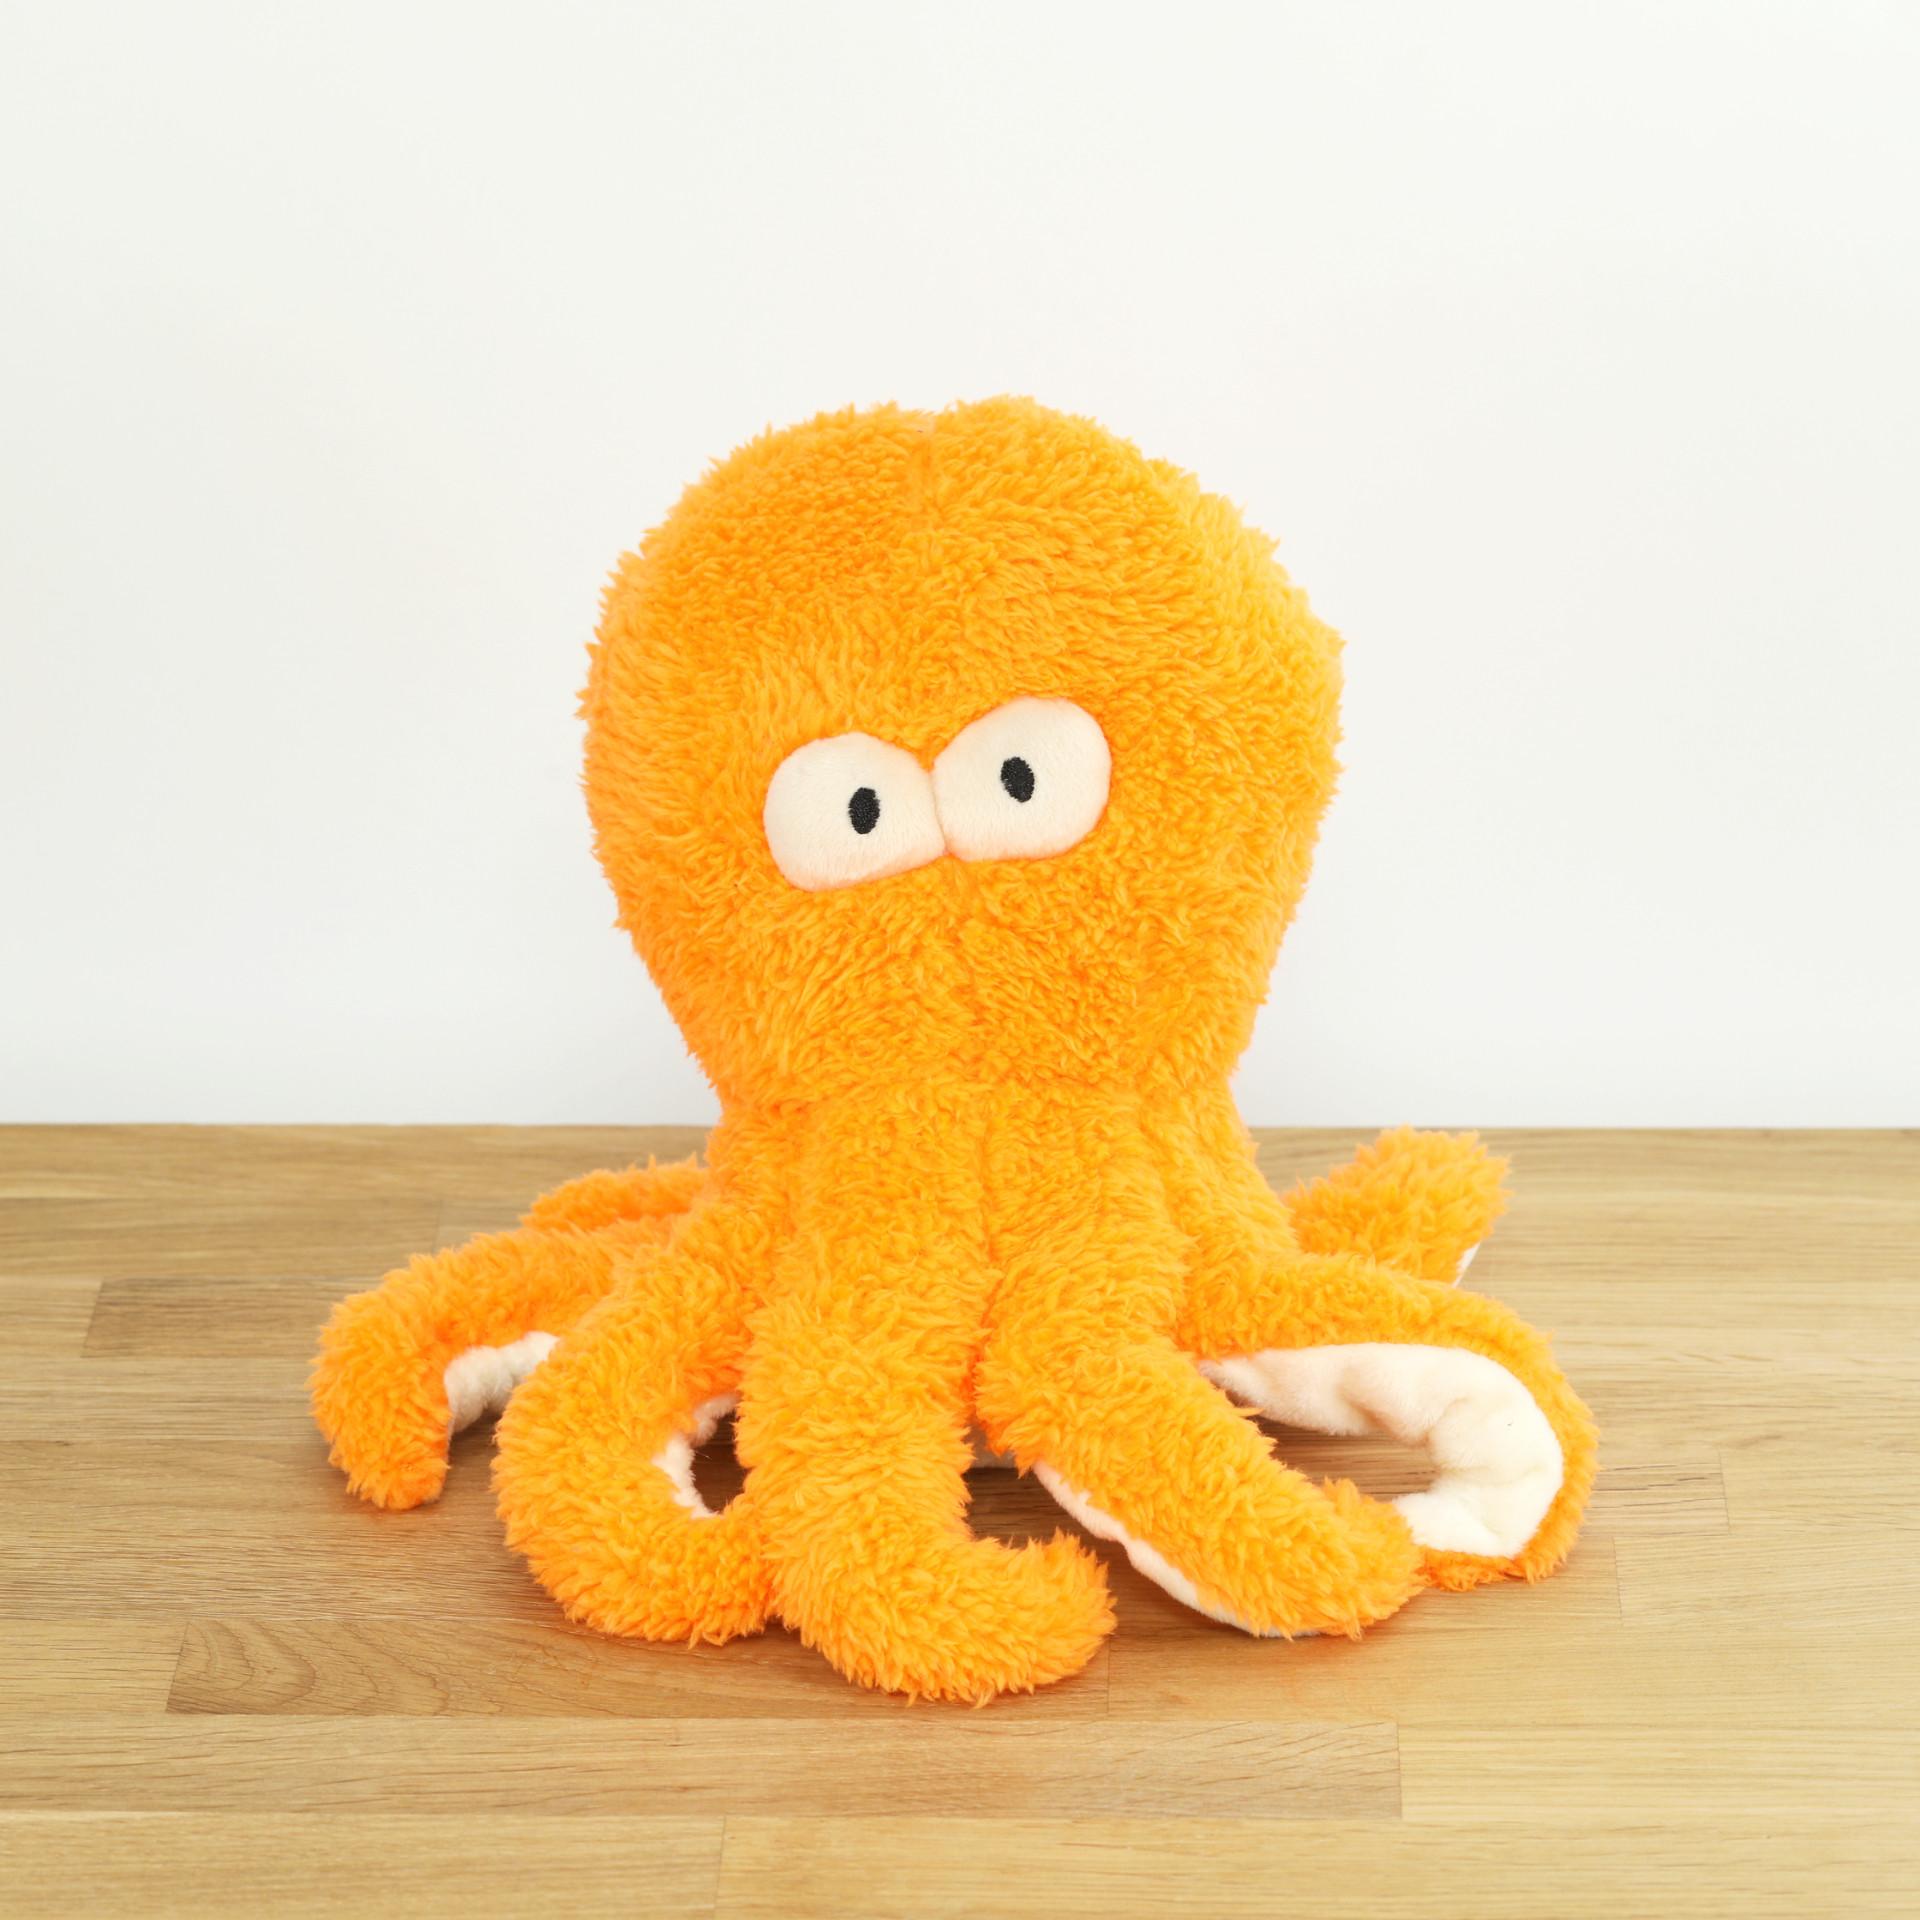 Hundespielzeug Sir Legs a Lot, der Oktopus